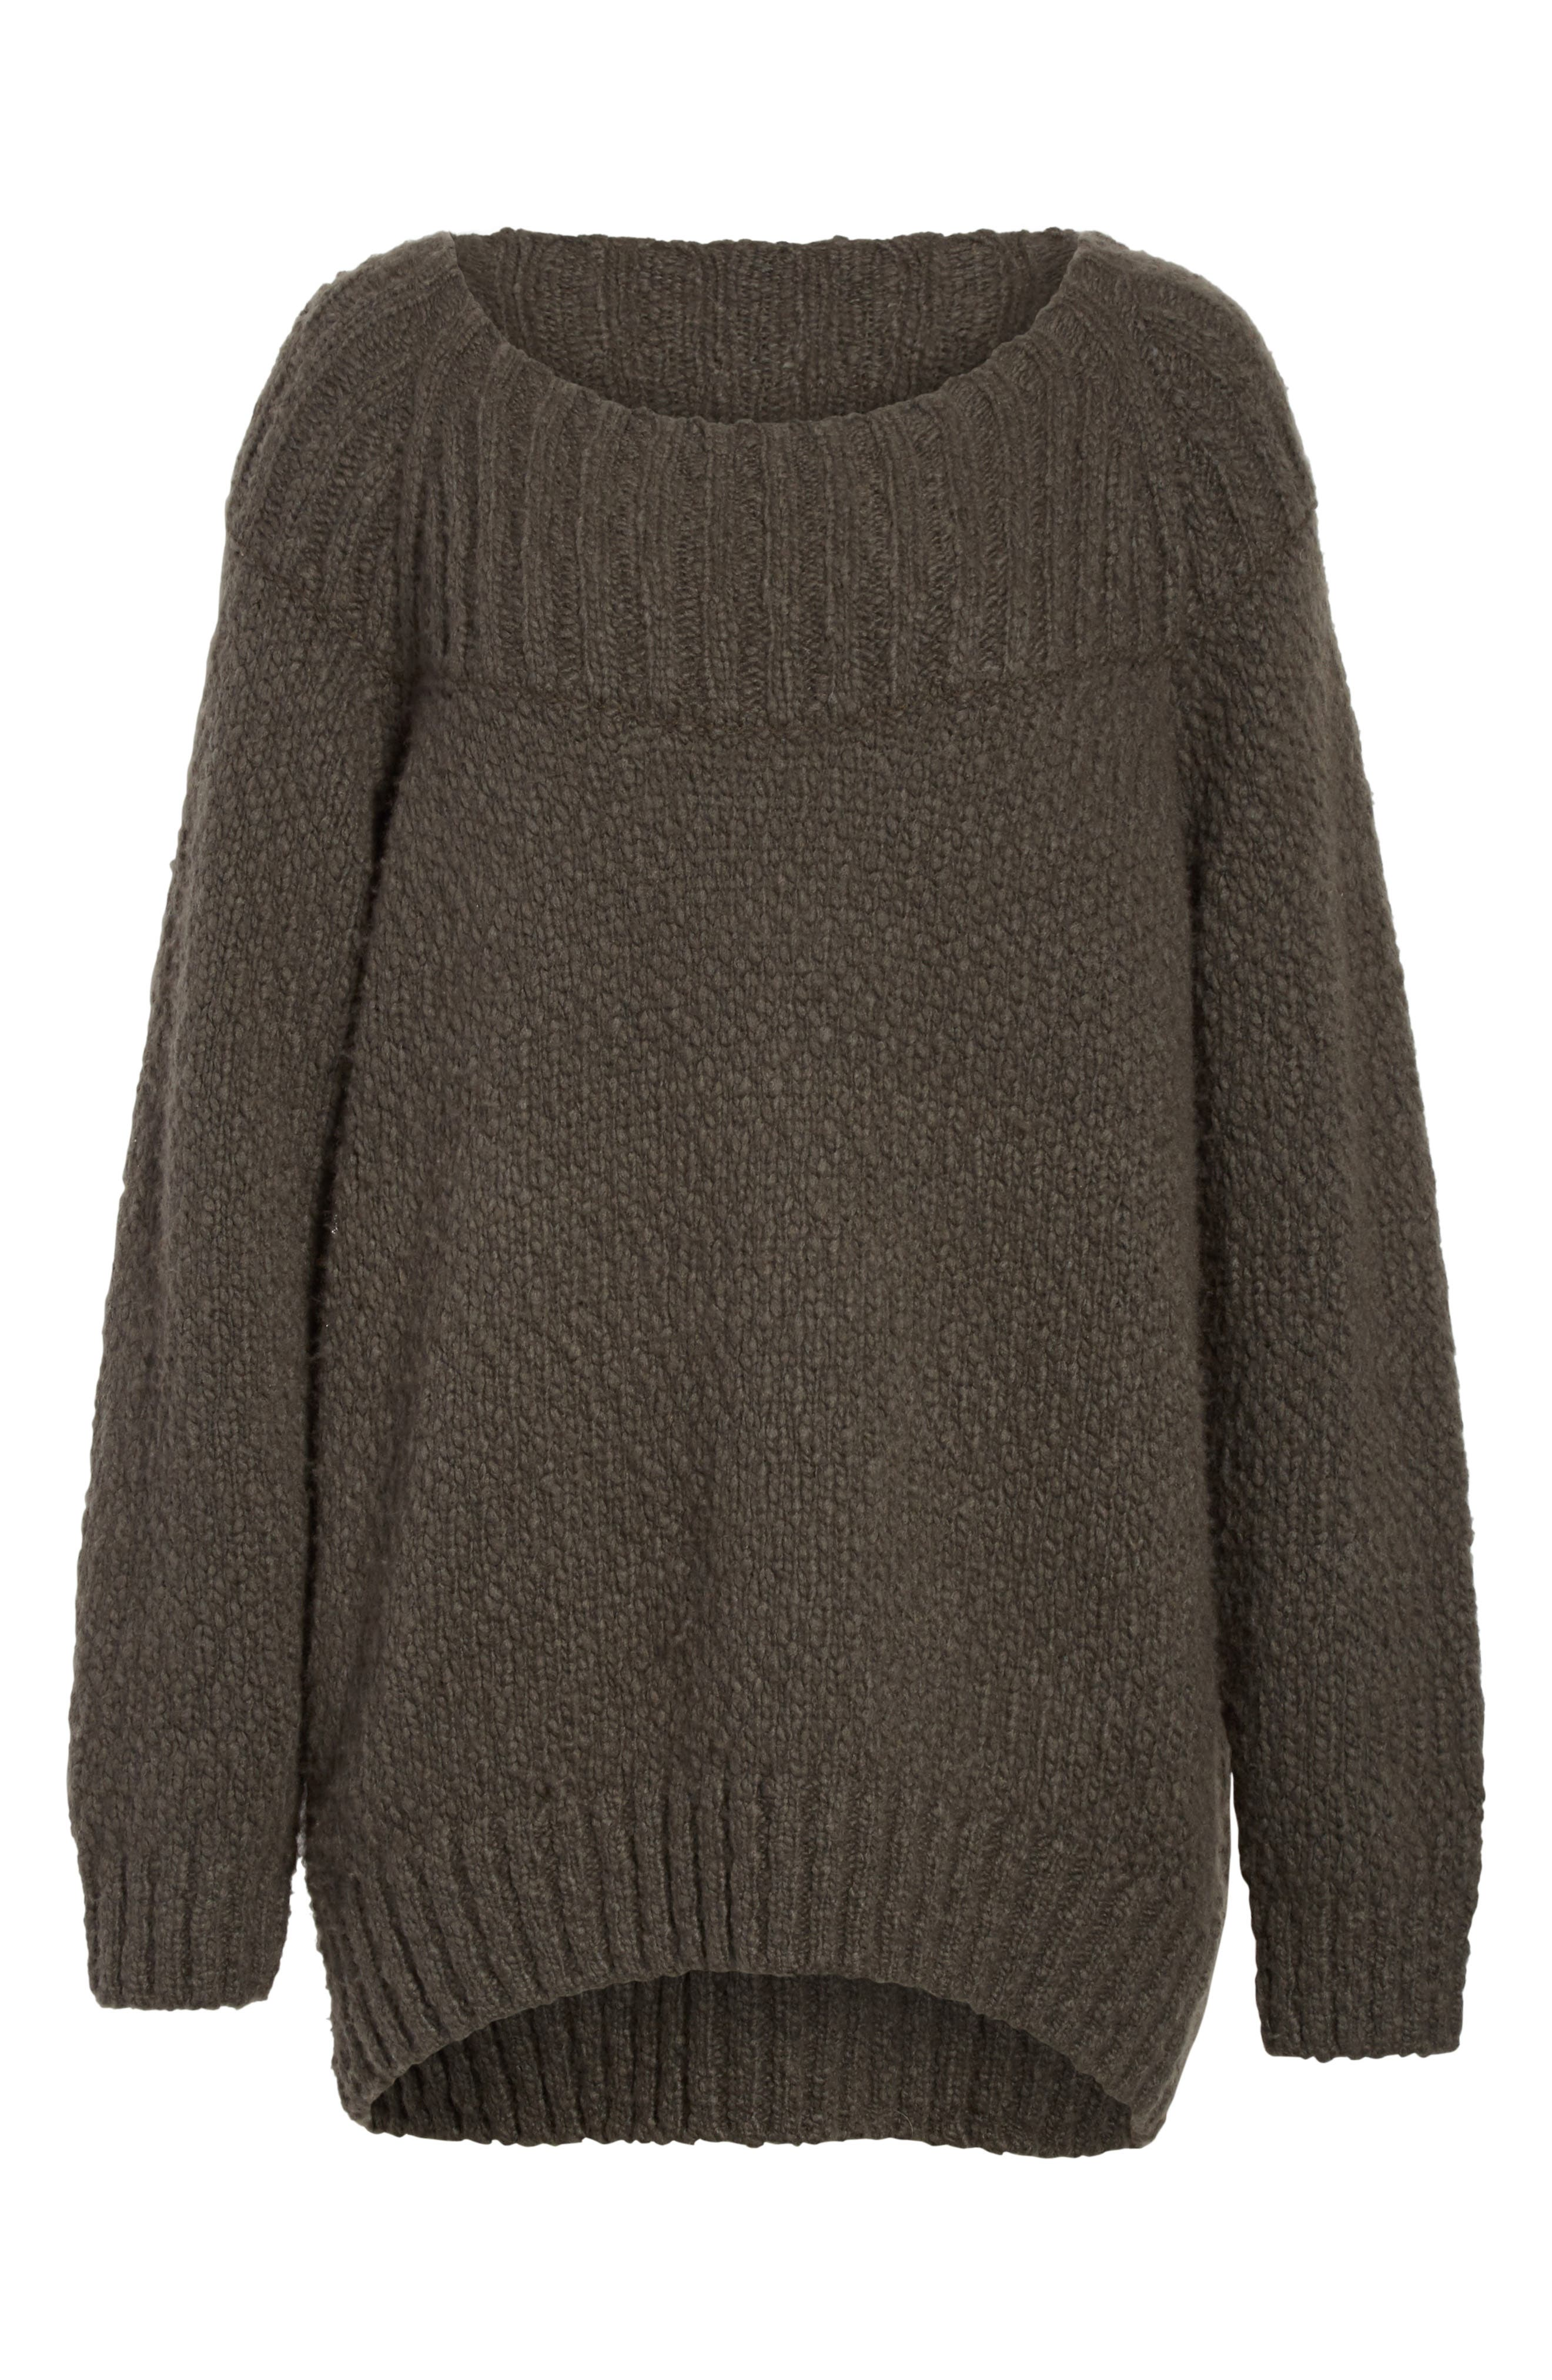 Ribbed Yoke Knit Sweater,                             Alternate thumbnail 6, color,                             Graphite